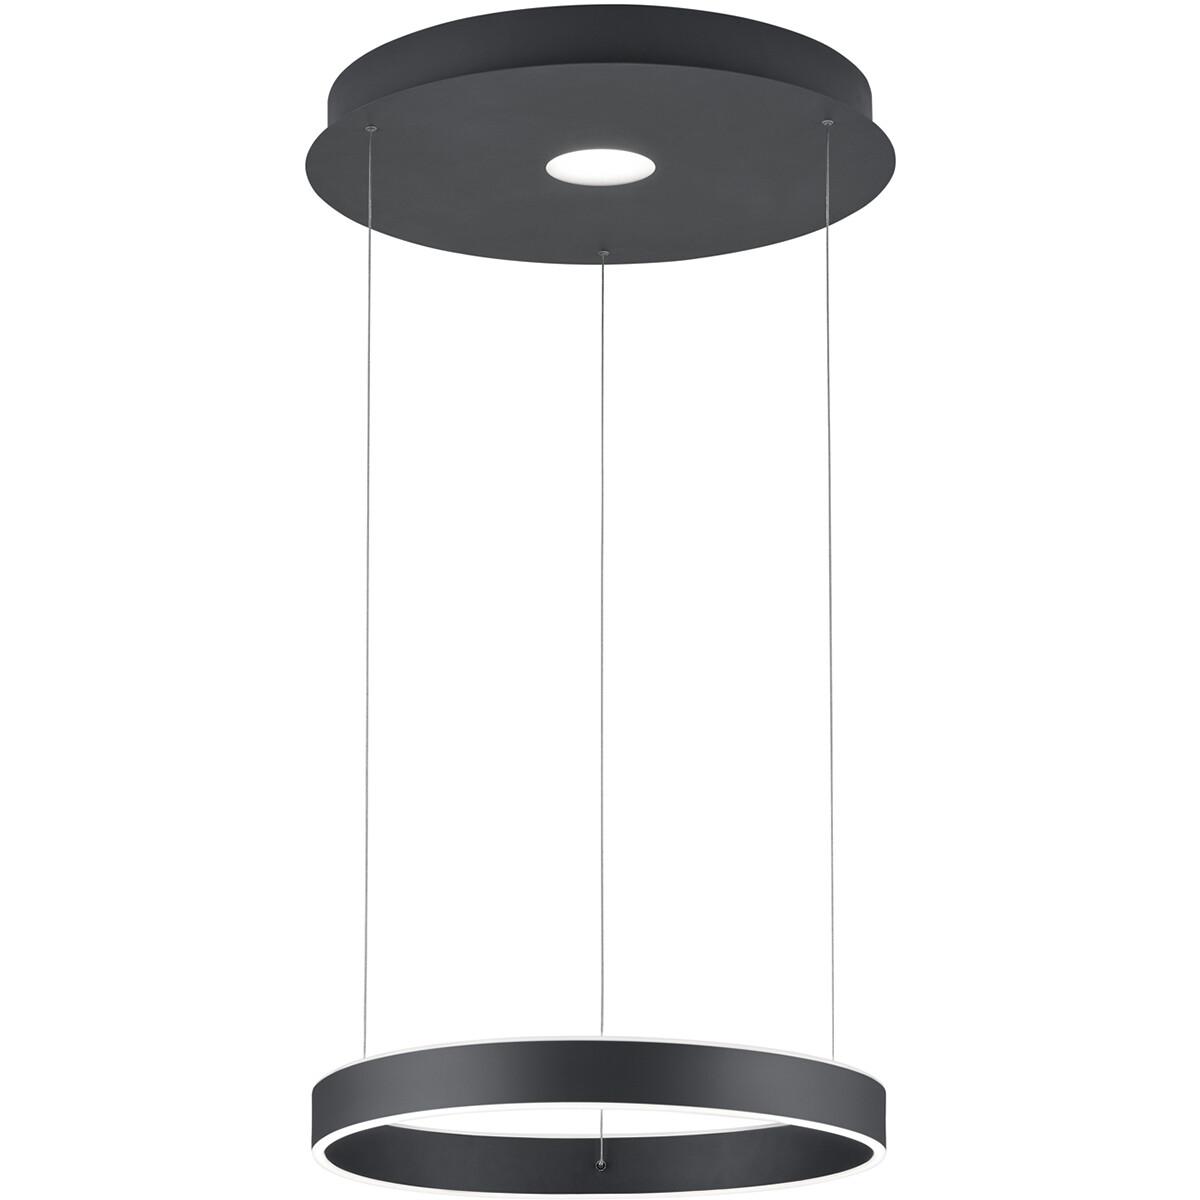 LED Hanglamp - Hangverlichting - Trion Lonag - 45W - Warm Wit 3000K - Rond - Mat Zwart - Aluminium